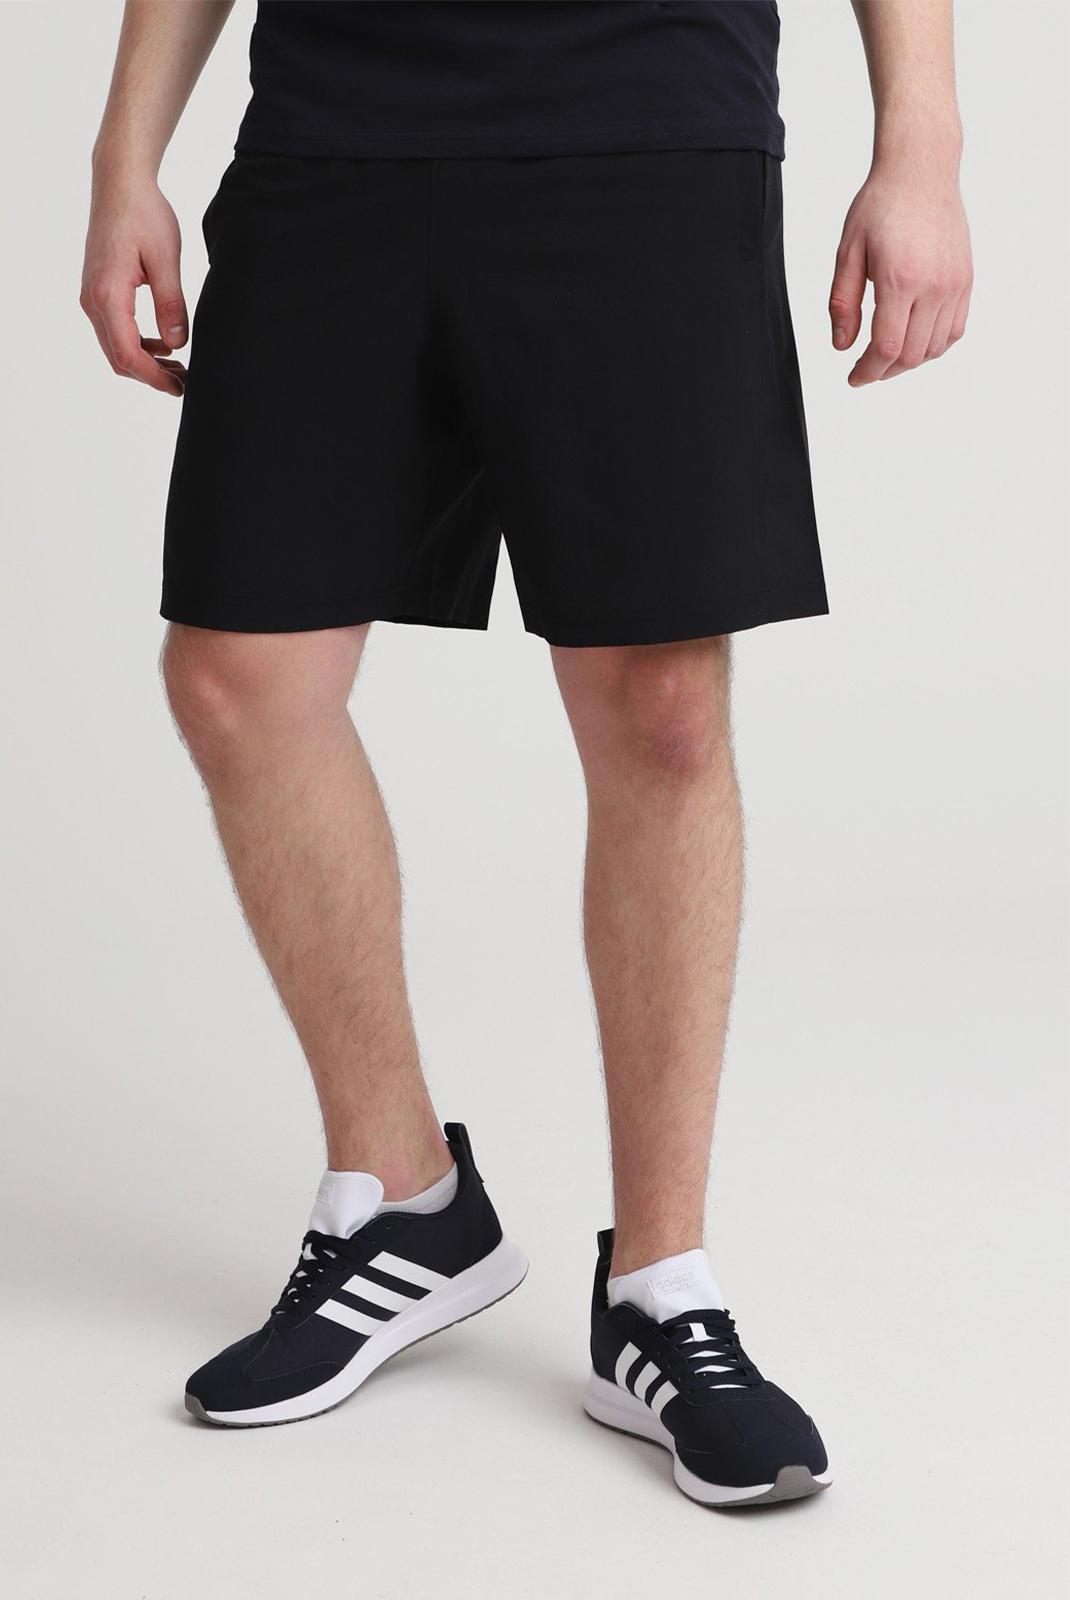 Shorts & Bermudas  Under armour 1320203-001 001 BLACK